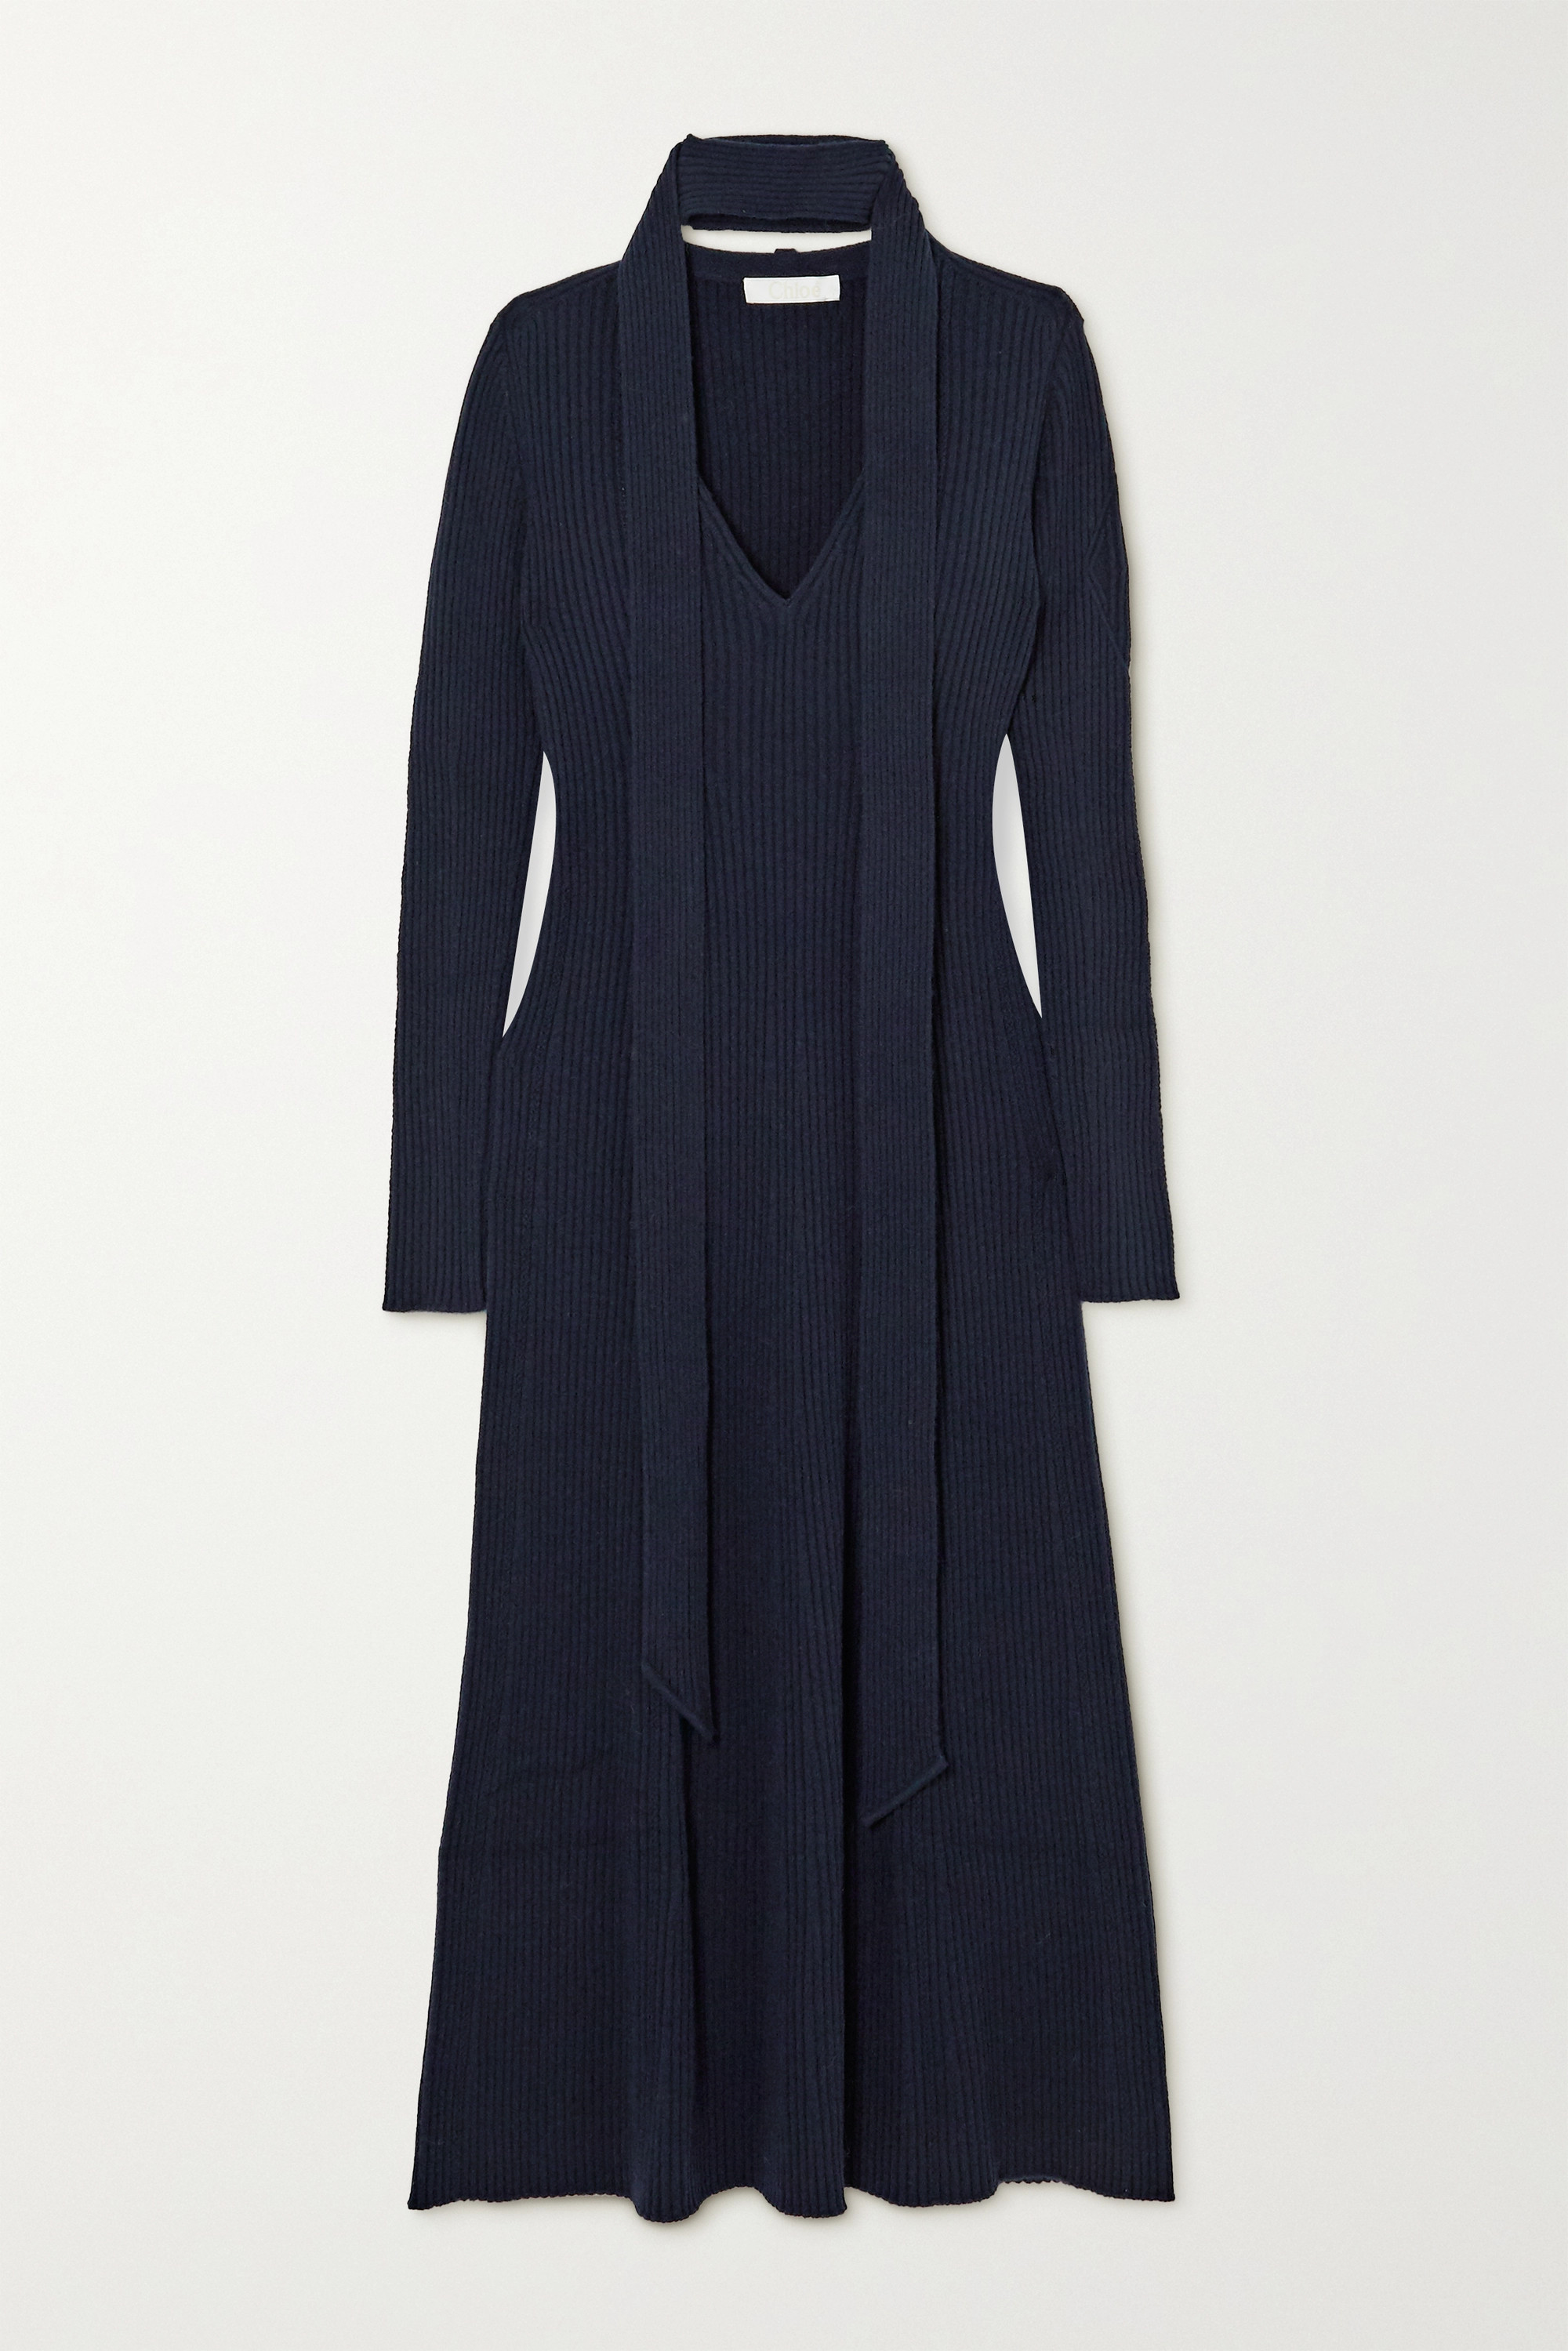 Chloé Tie-neck ribbed wool and silk-blend midi dress